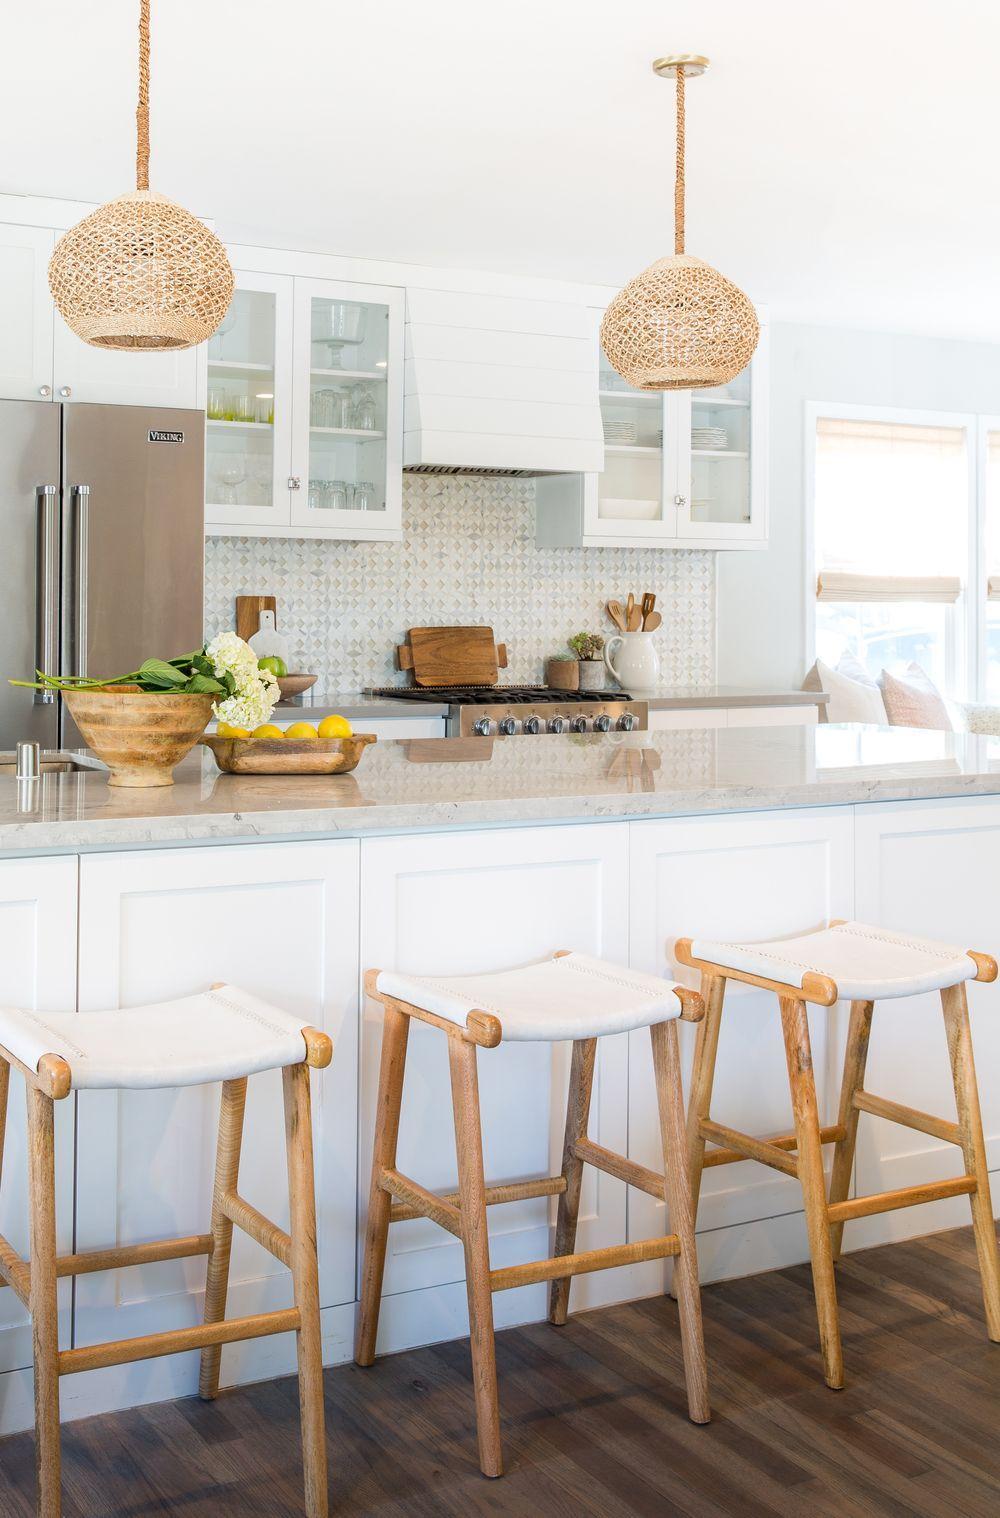 Blue Lamps Lighting Ideas For Coastal Rooms Coastal Room Blue Kitchen Island Beach House Kitchens